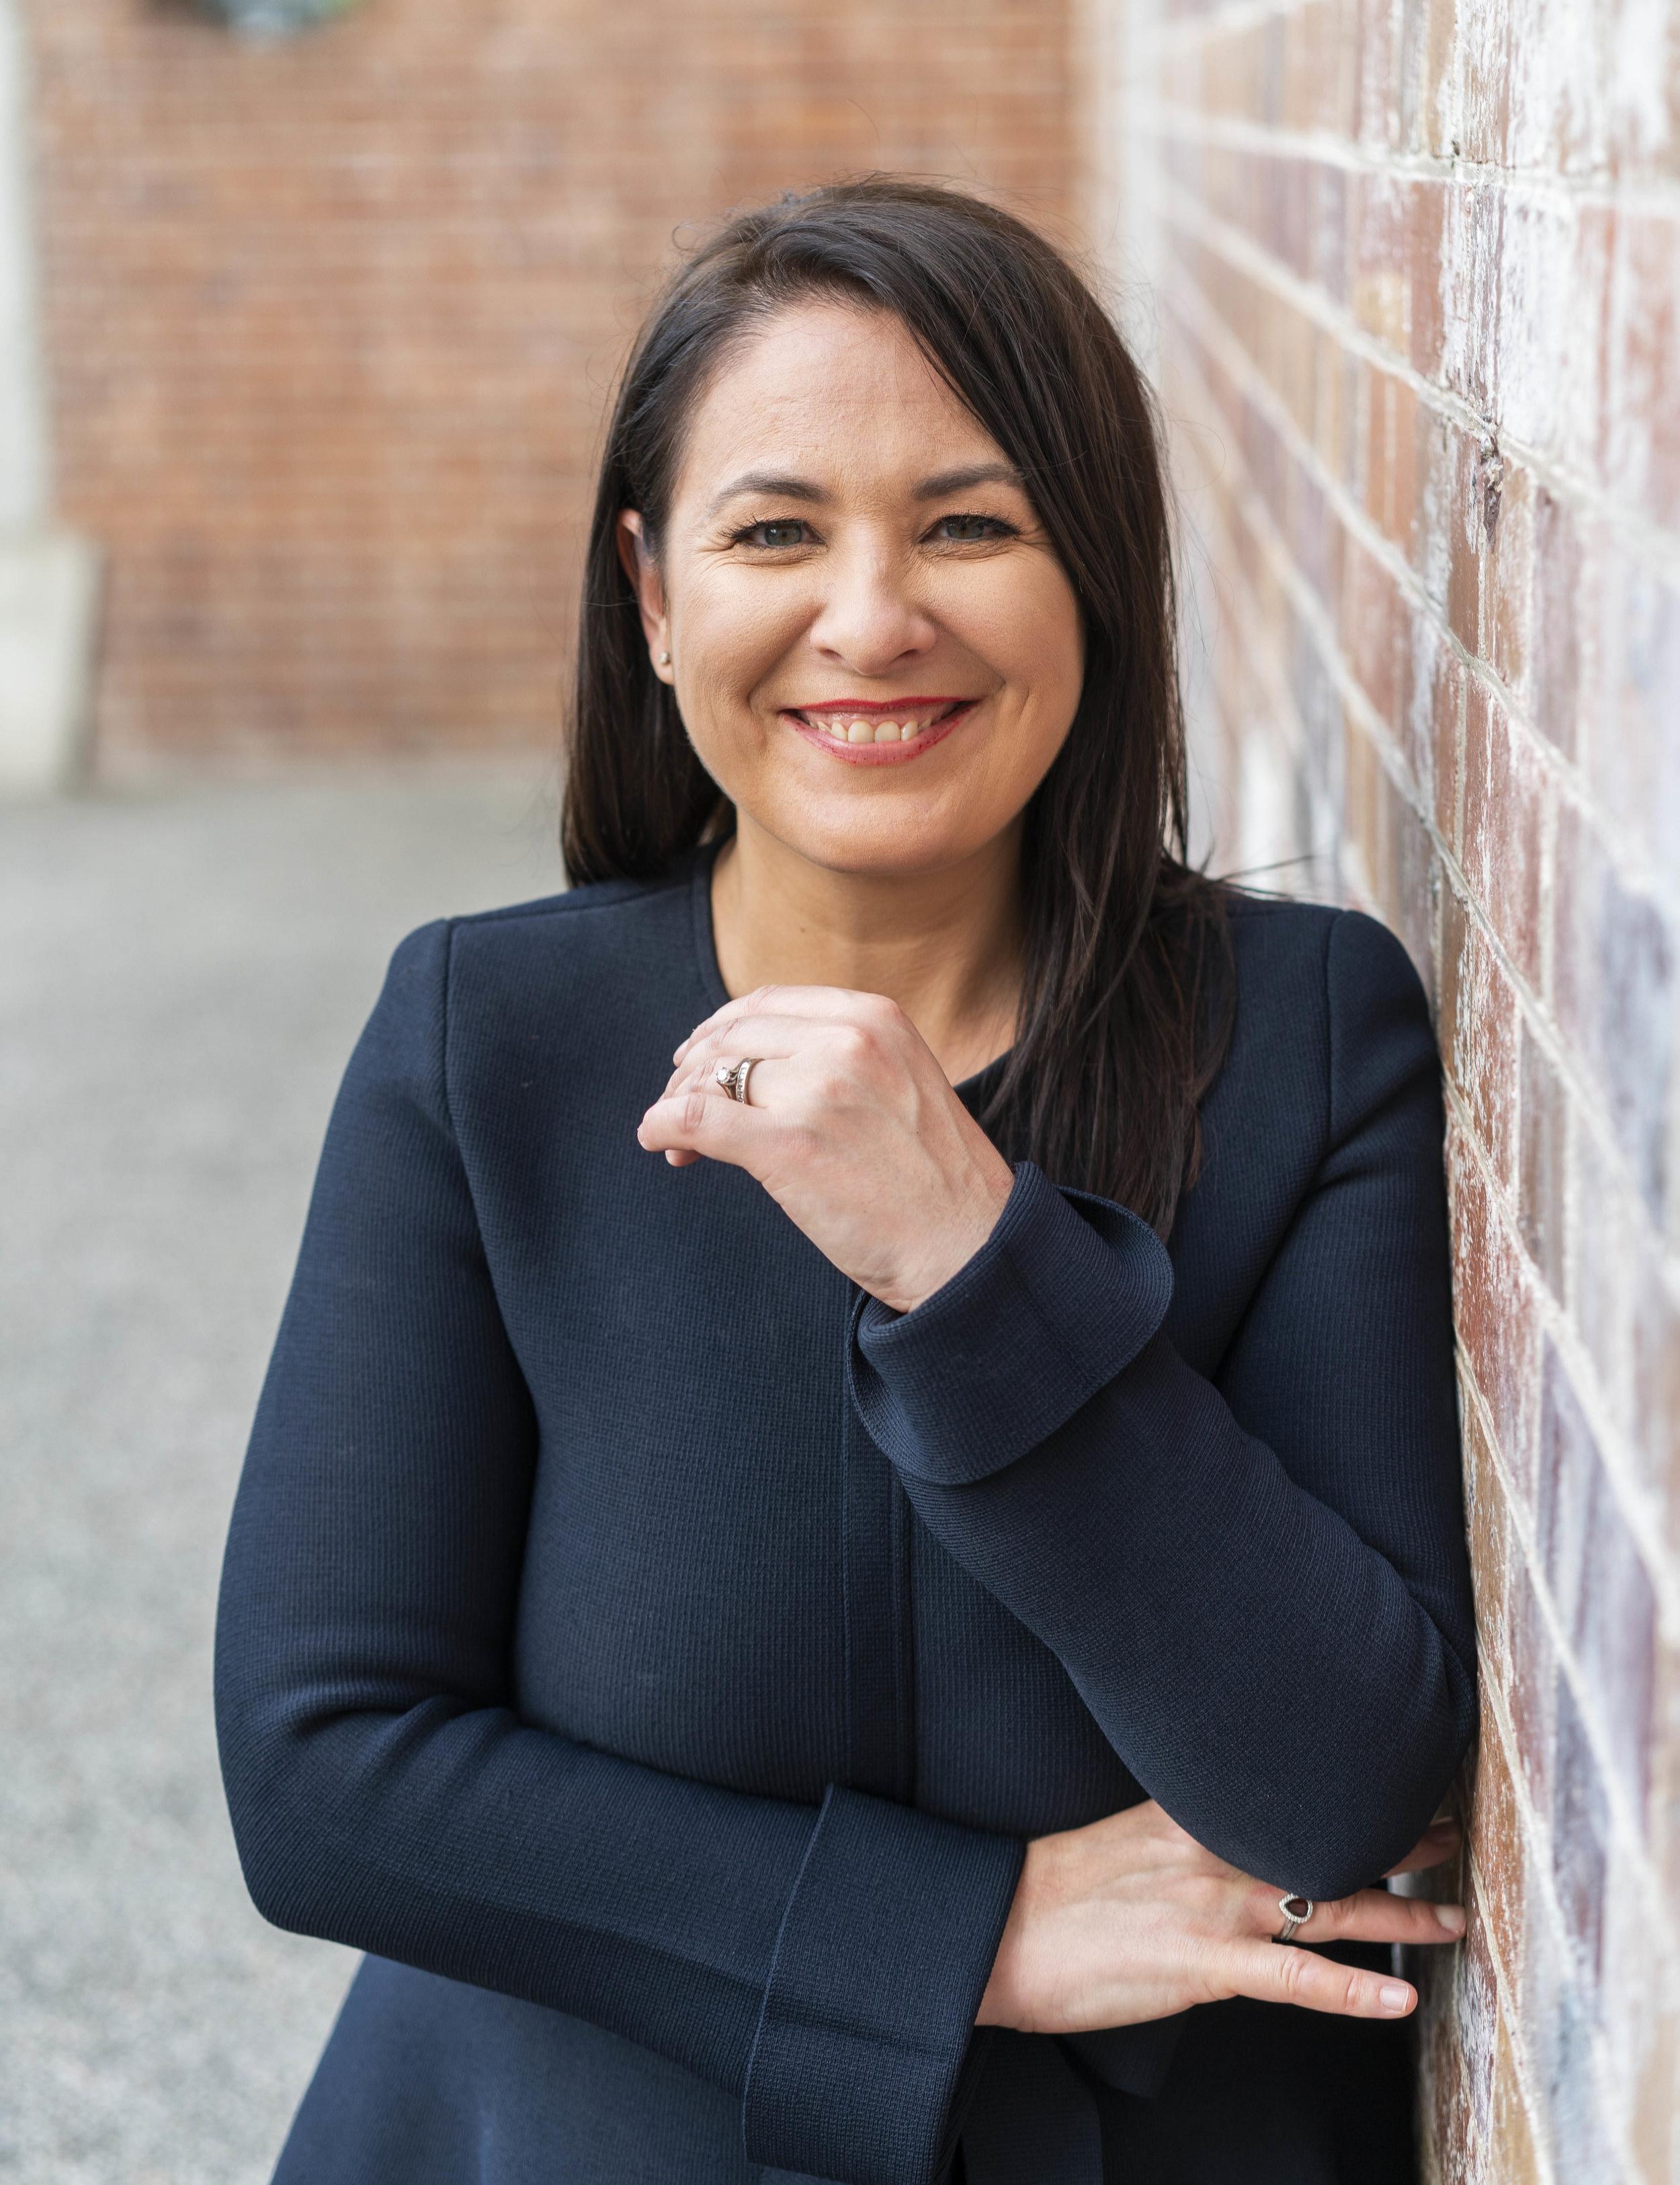 Louise O'Reilly - Brisbane Family Lawyer